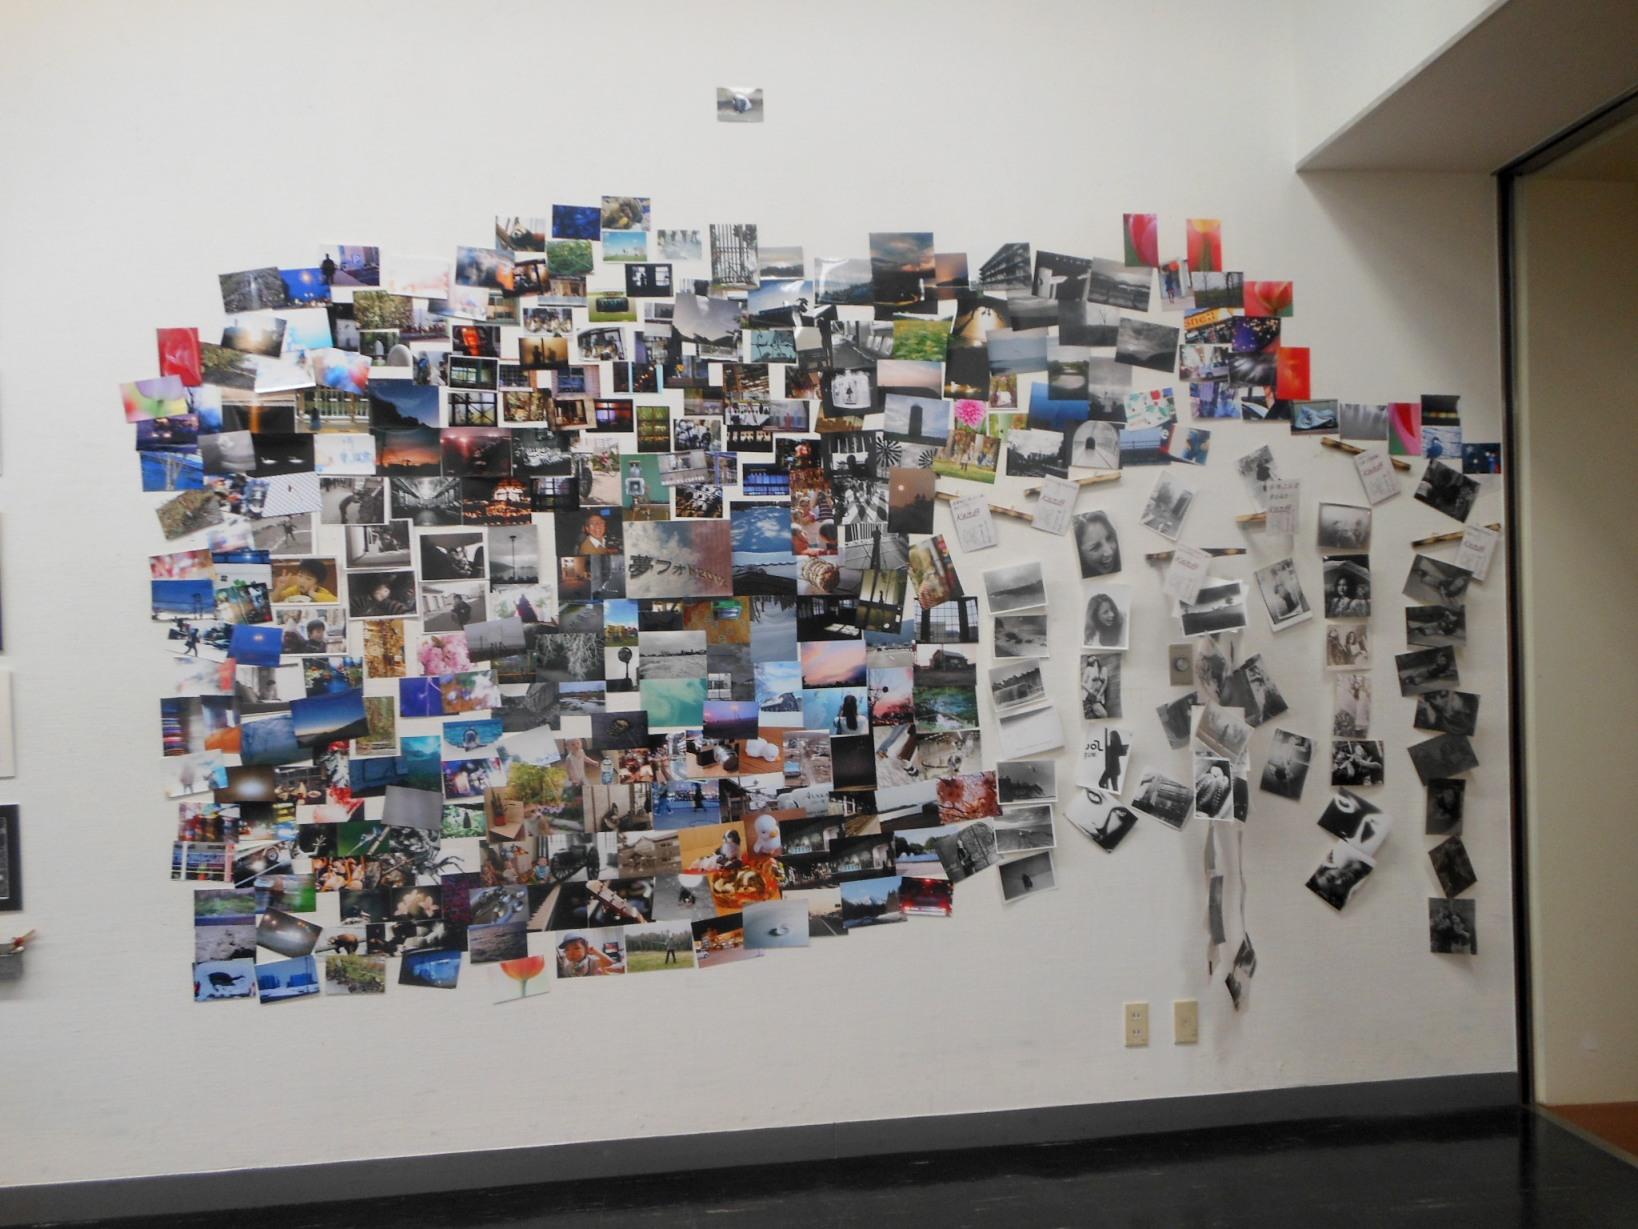 1885)②「写真クラブ「BePHaT!!」 第9回作品展 『夢 Photo 2012』」市民g. 終了11月21日(水)~11月25日(日)_f0126829_2145246.jpg